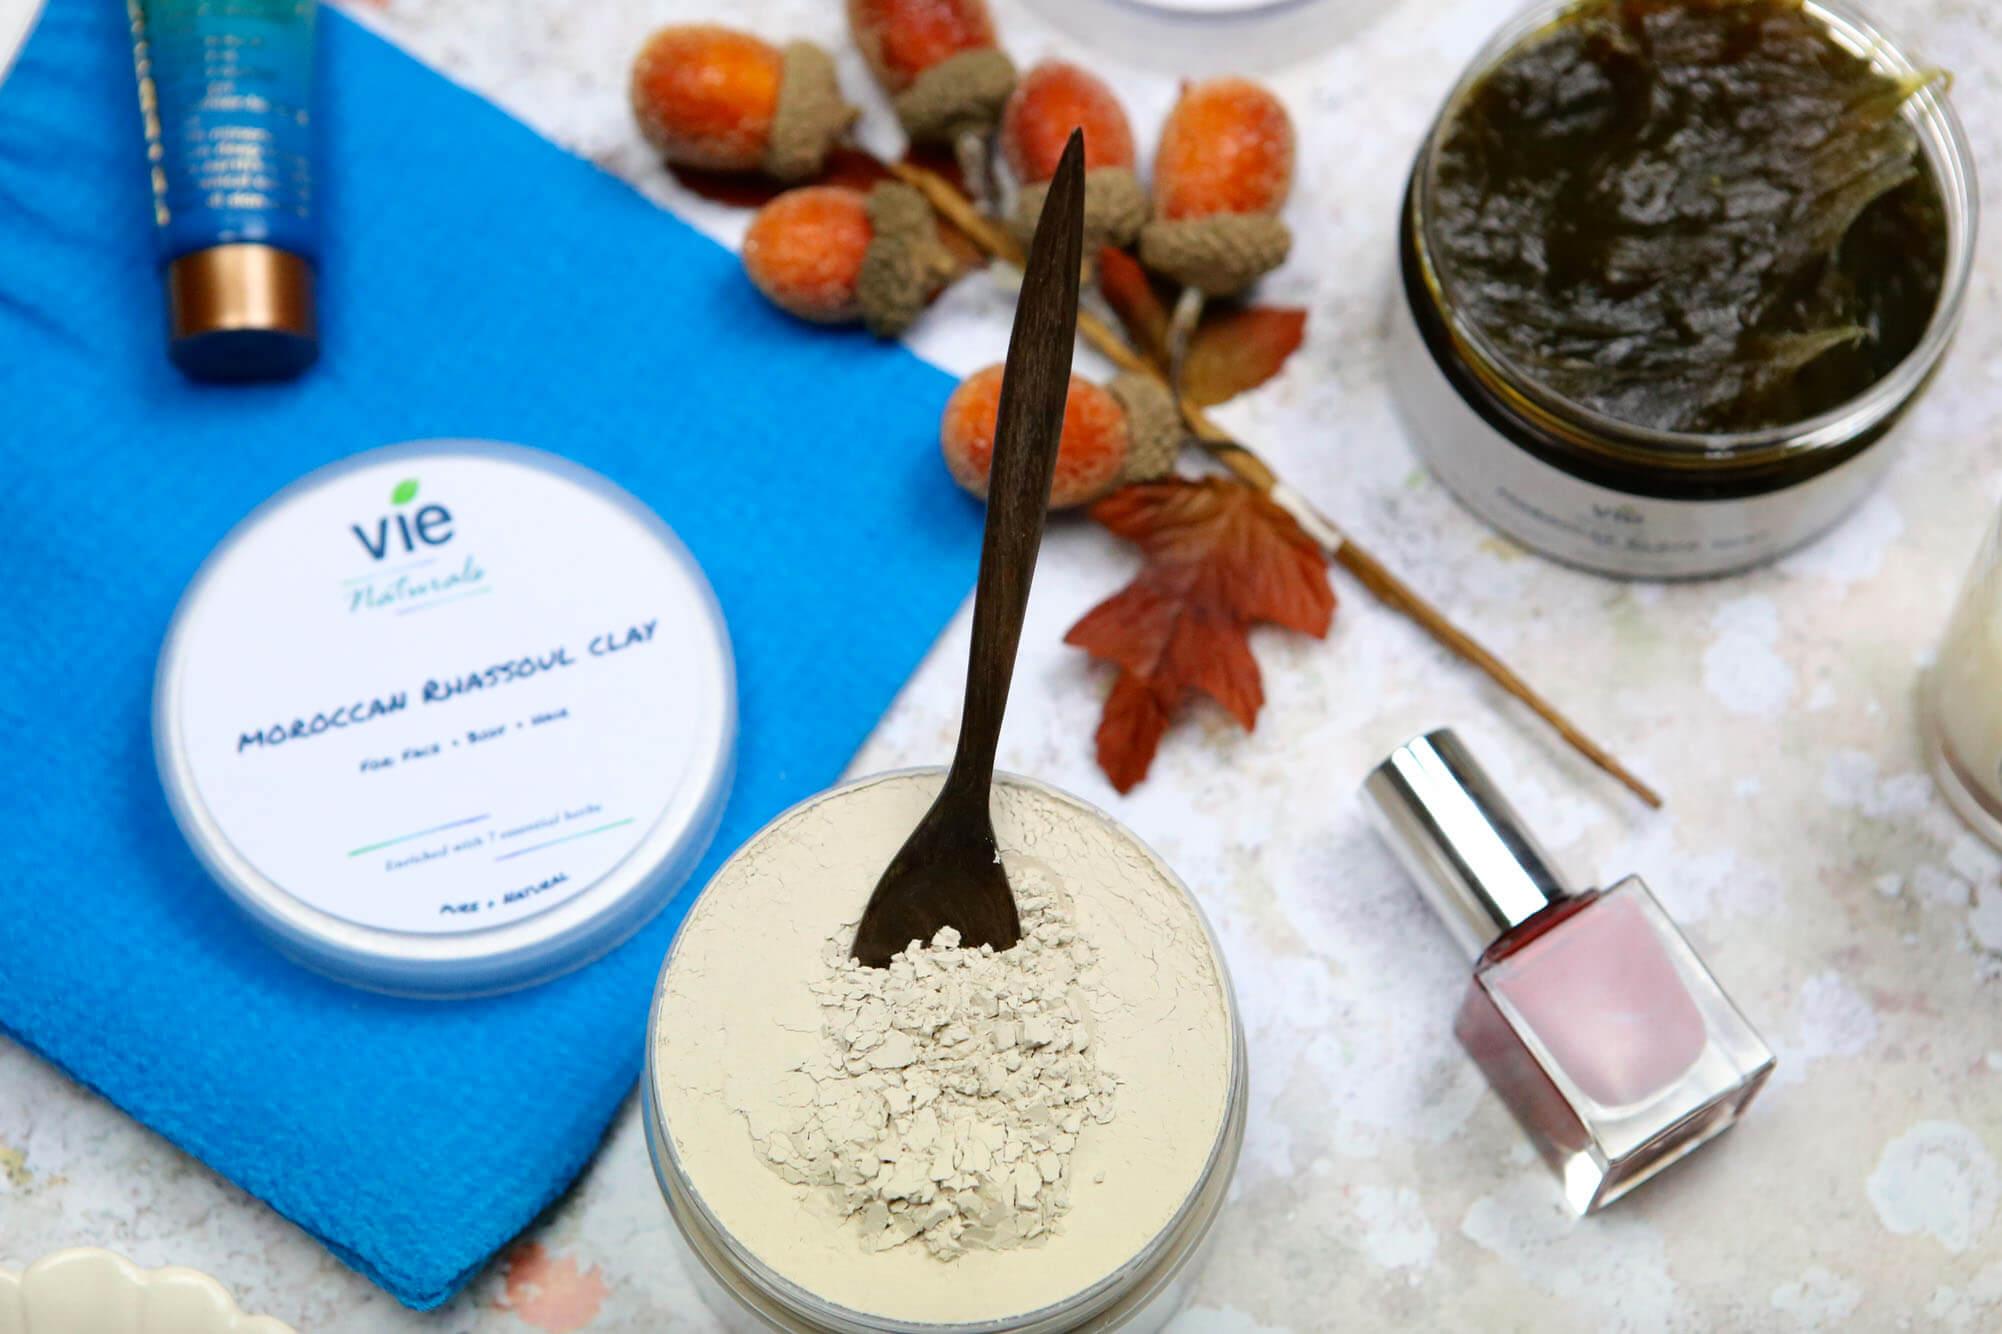 Birthday pampering essentials- Clay mask